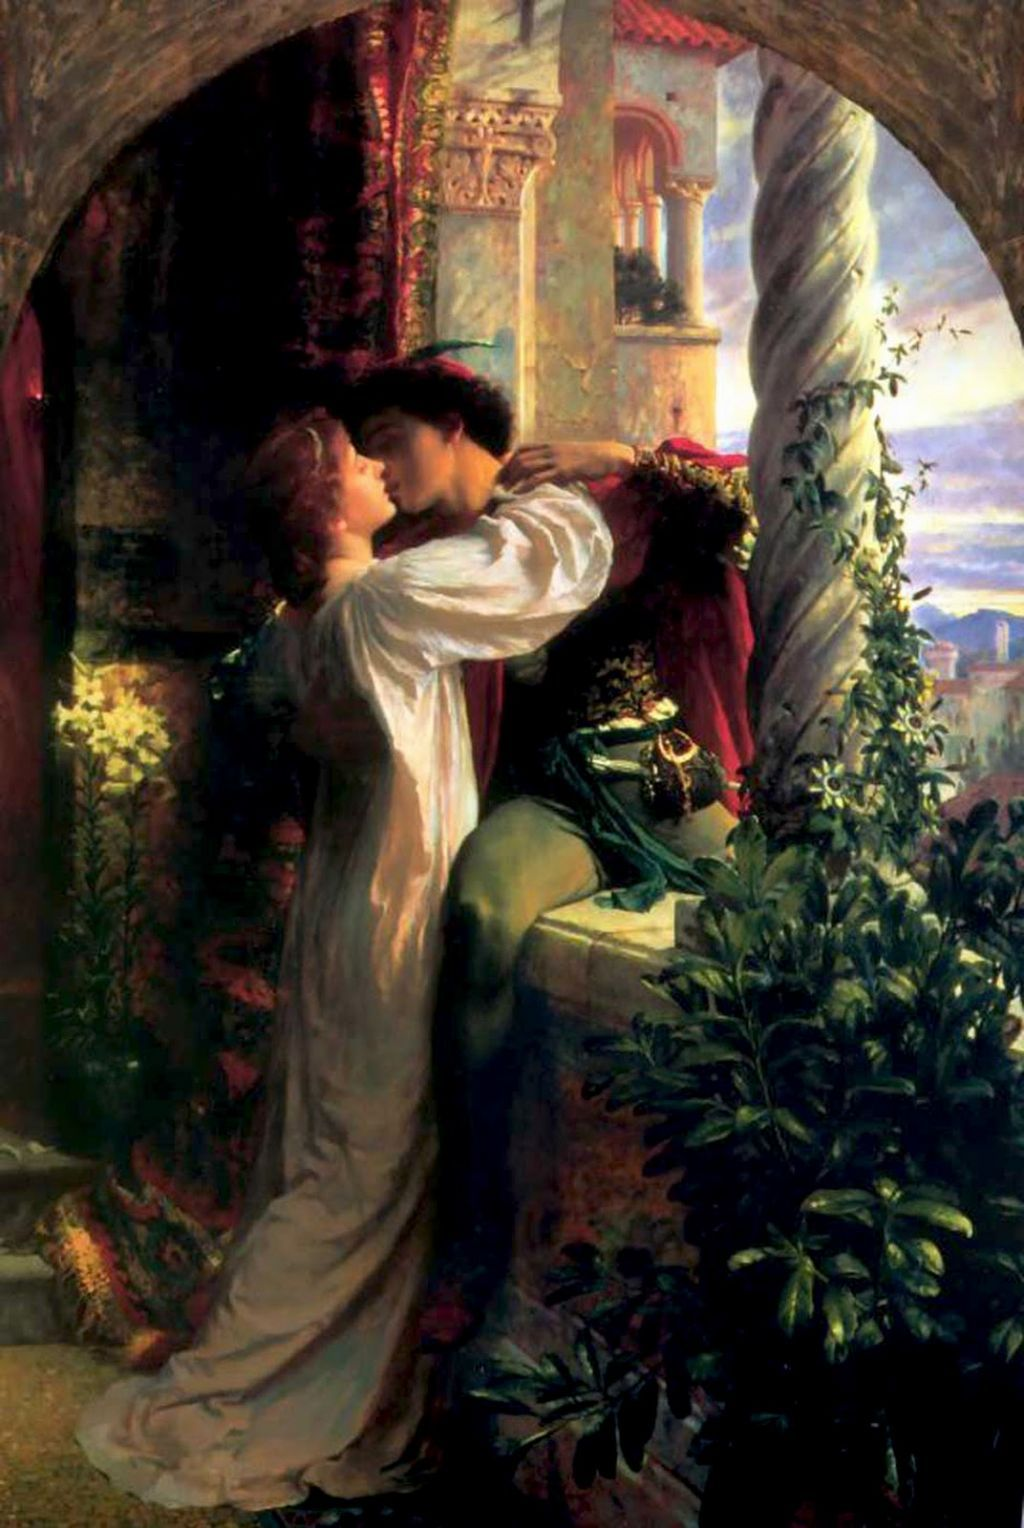 Romeo and juliet immature love essay